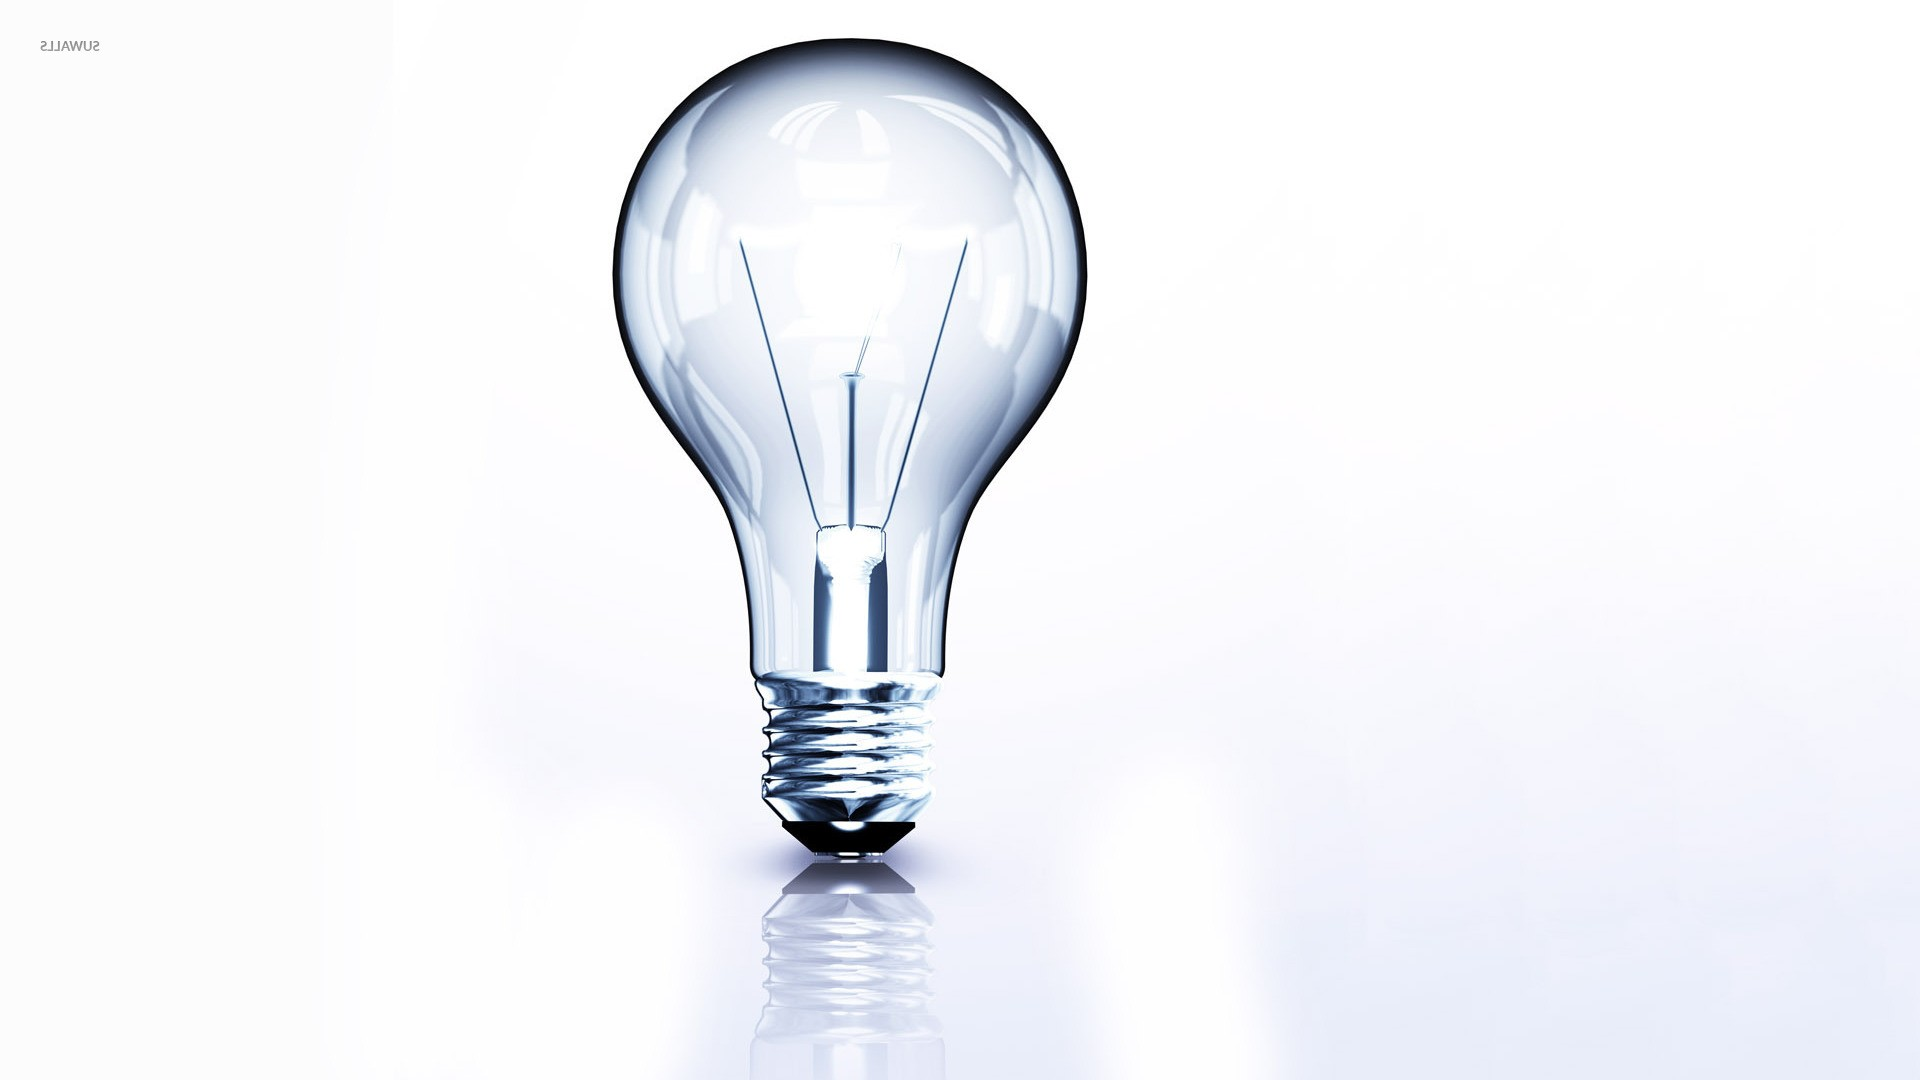 1920x1080 Vintage Light Bulb Vector Free Light Bulb Vector Illuminate Life